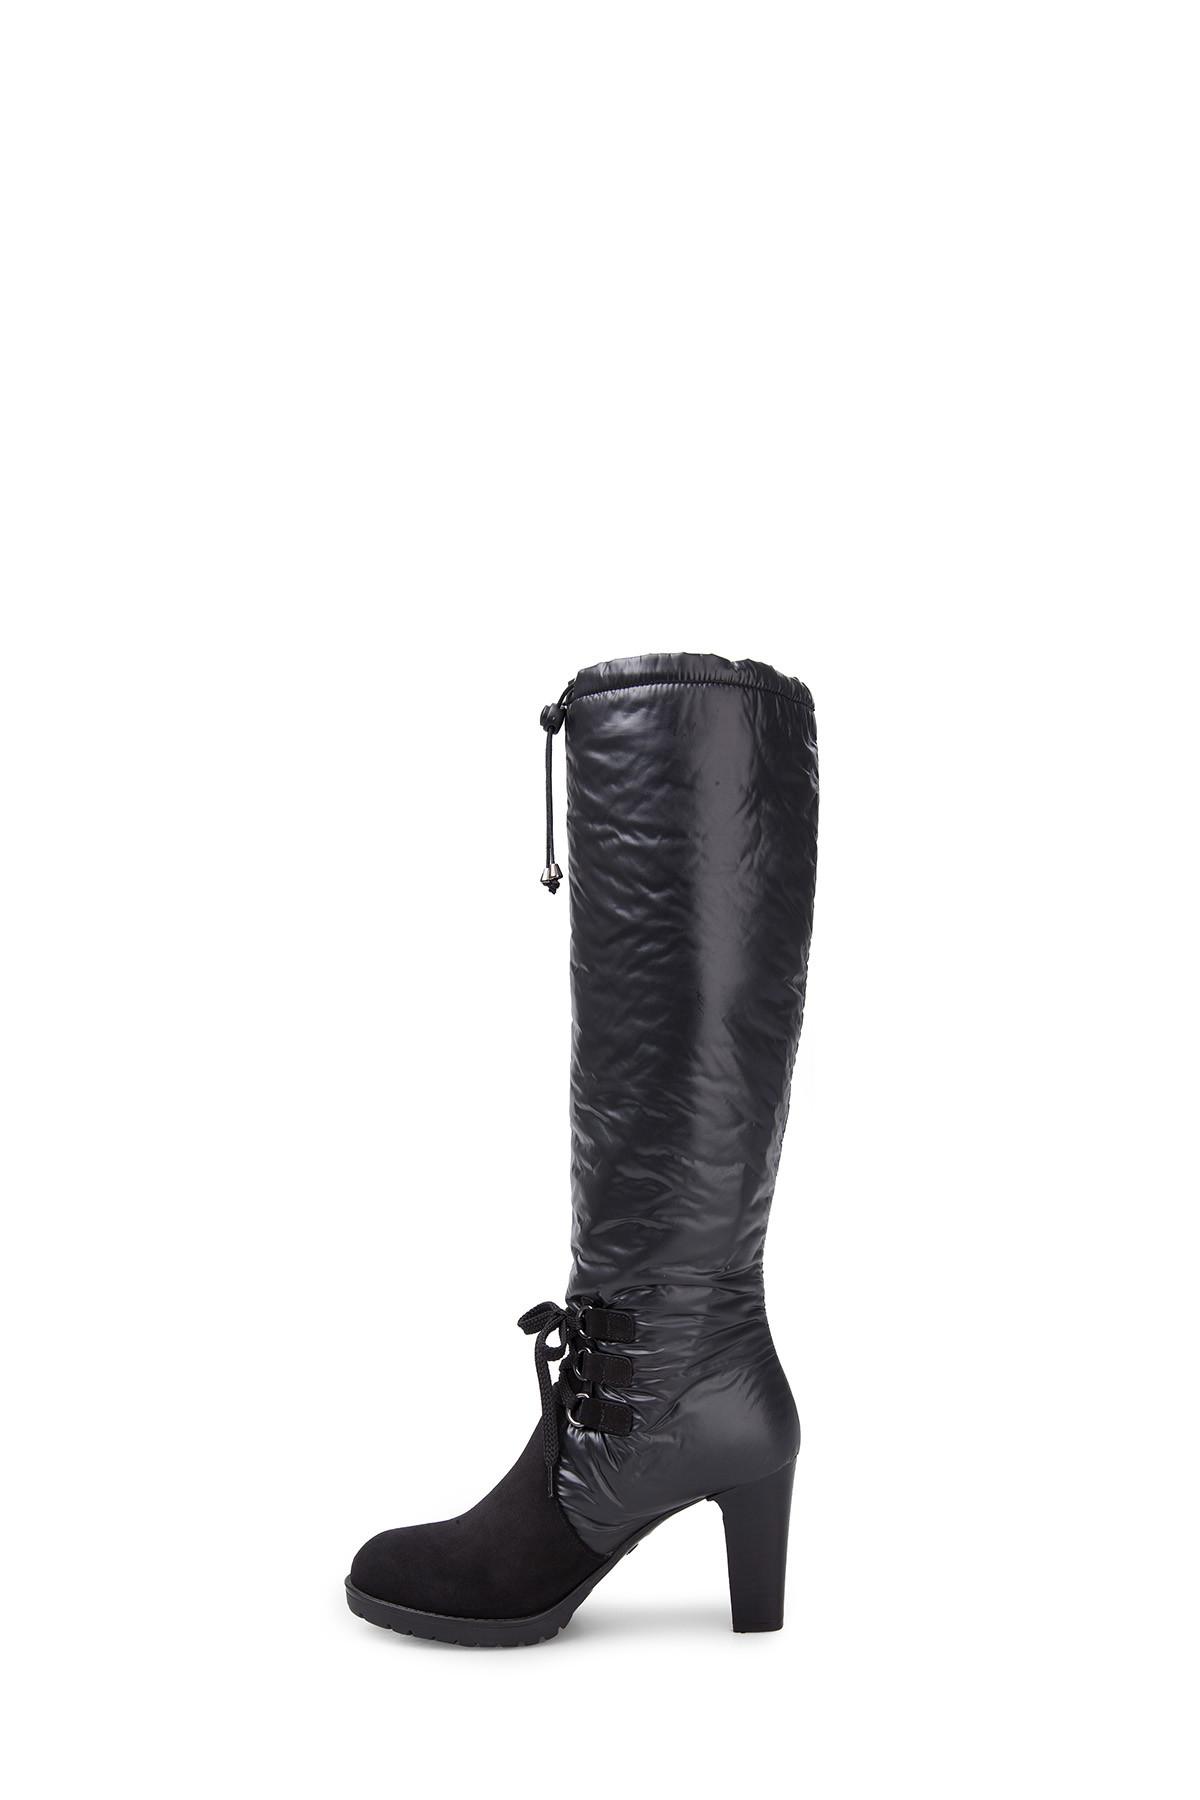 ALBERTO GUARDIANI Kadın Siyah Çizme ZOXSD47397 2